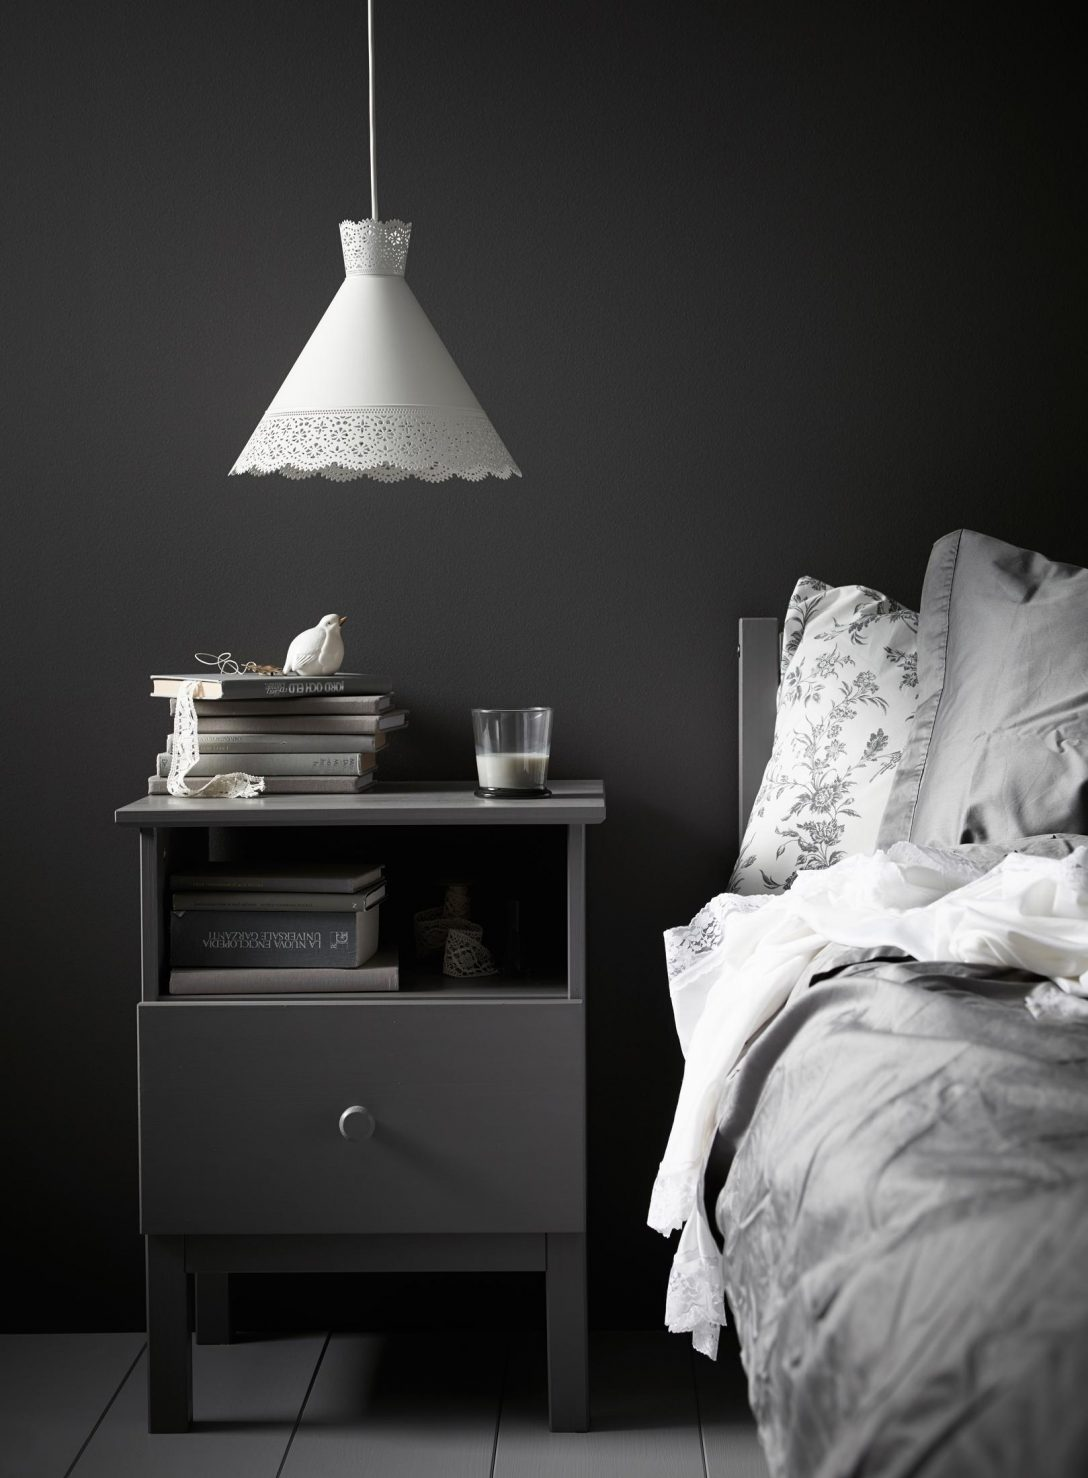 Large Size of Graues Bett Dunkel Samtsofa Ikea Kombinieren 140x200 Bettlaken 160x200 Waschen Passende Wandfarbe 120x200 Einfaches 140 Tojo V Außergewöhnliche Betten Weiß Bett Graues Bett